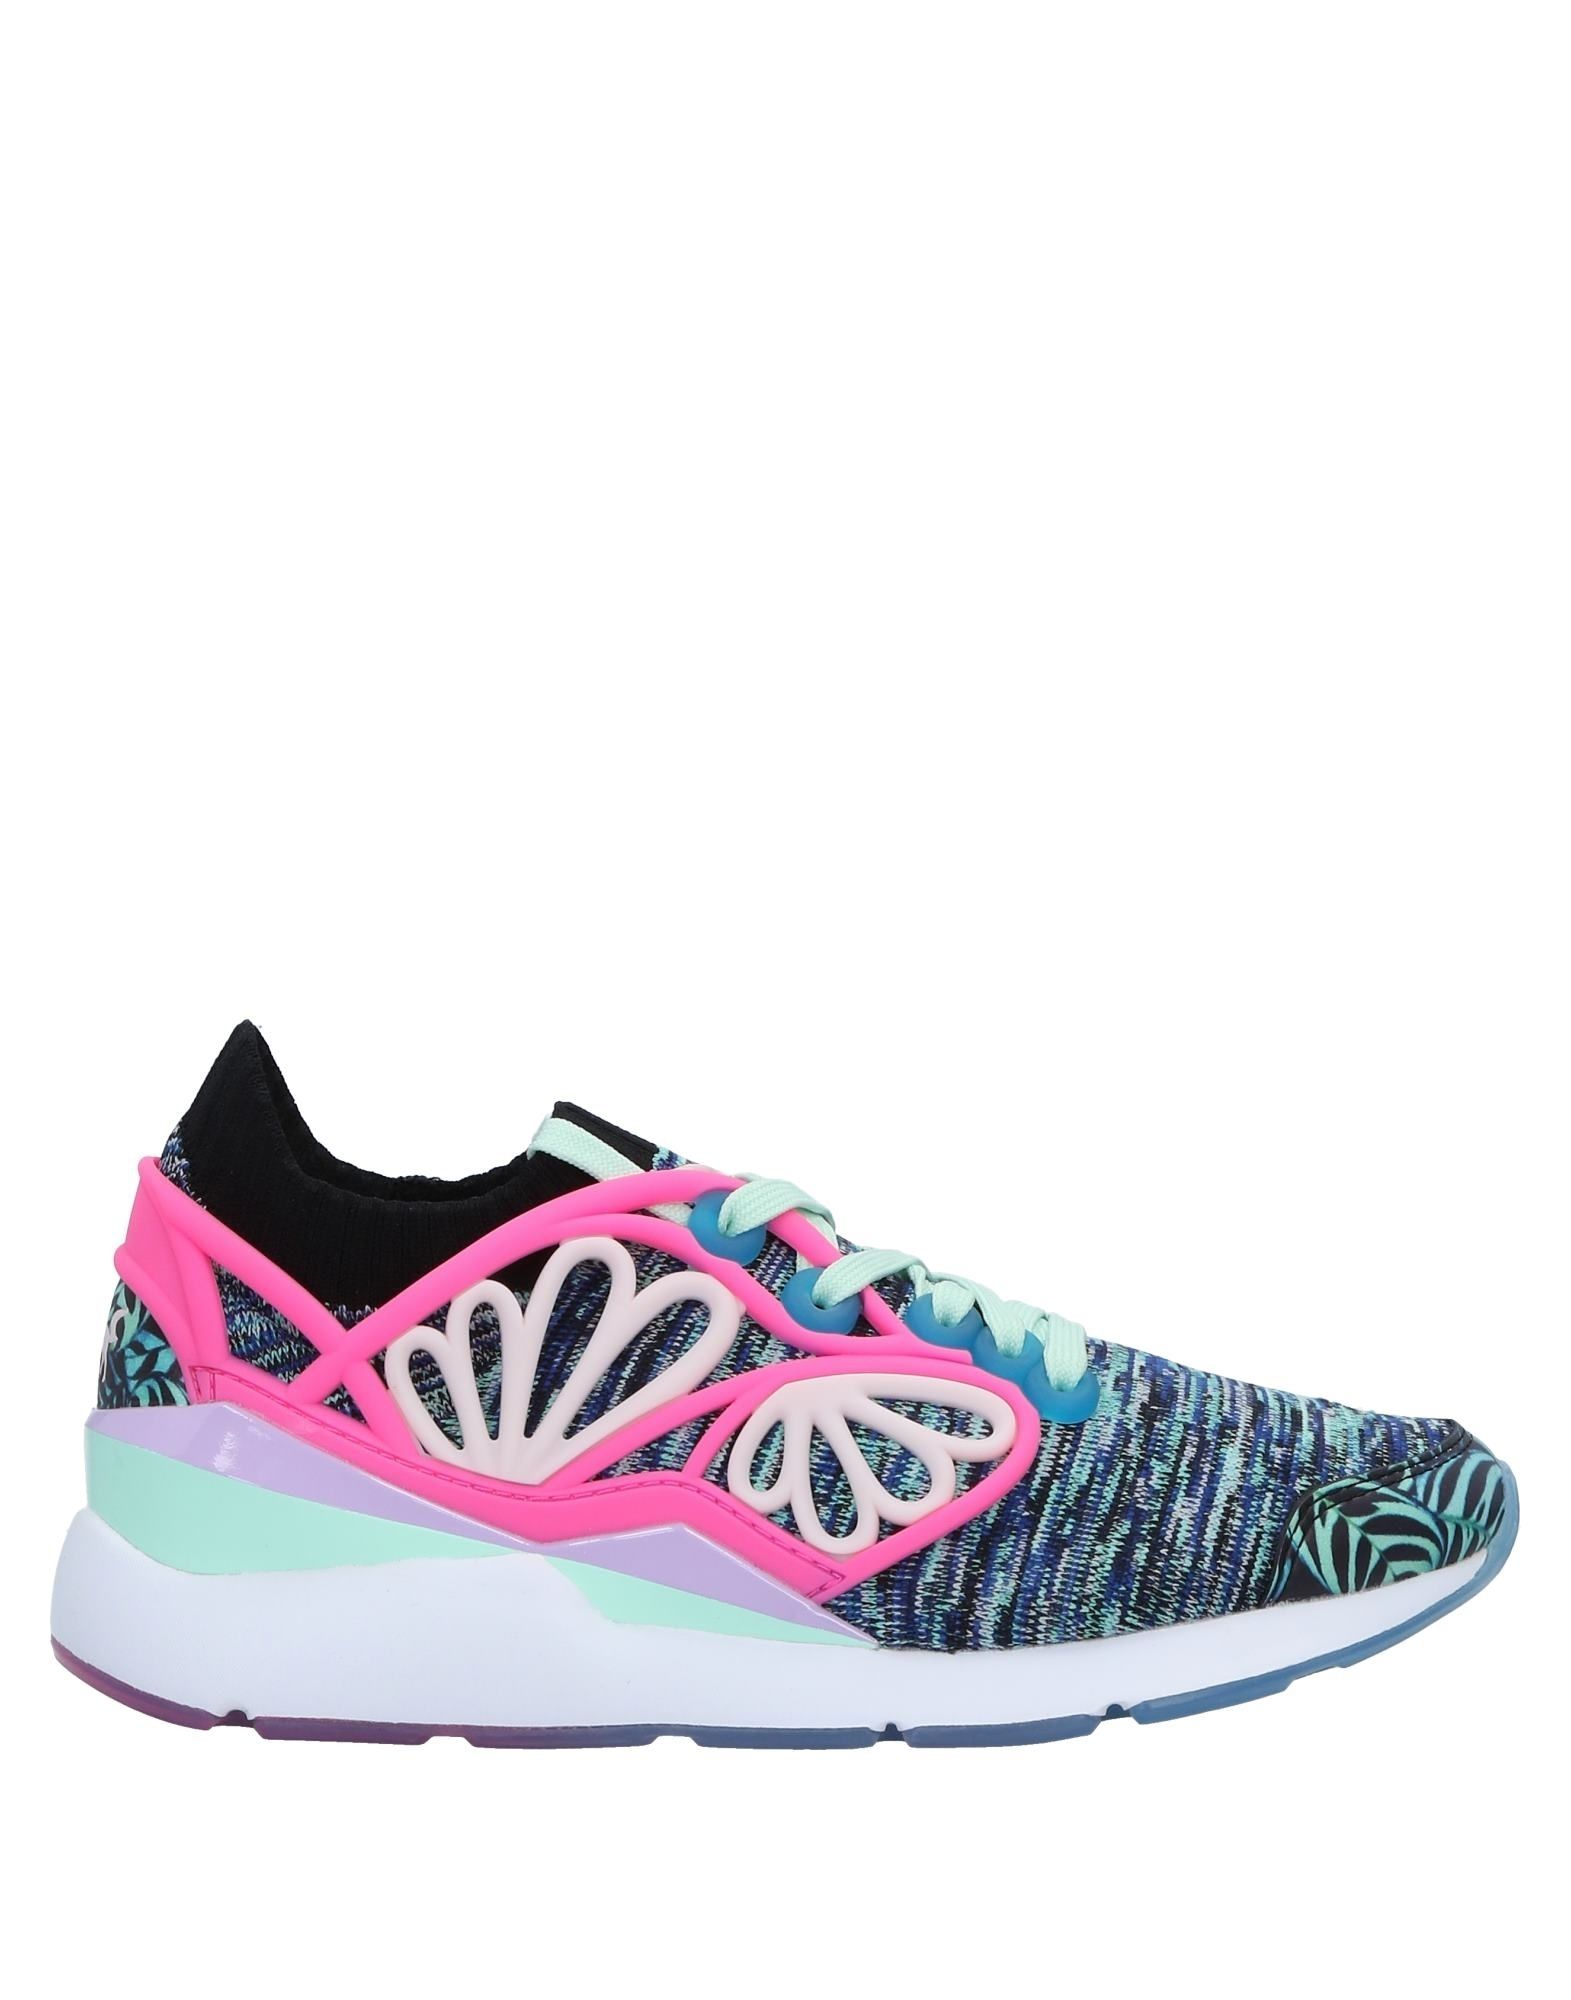 Puma X Sophia Webster Sneakers Damen  11497509LQ Gute Qualität beliebte Schuhe